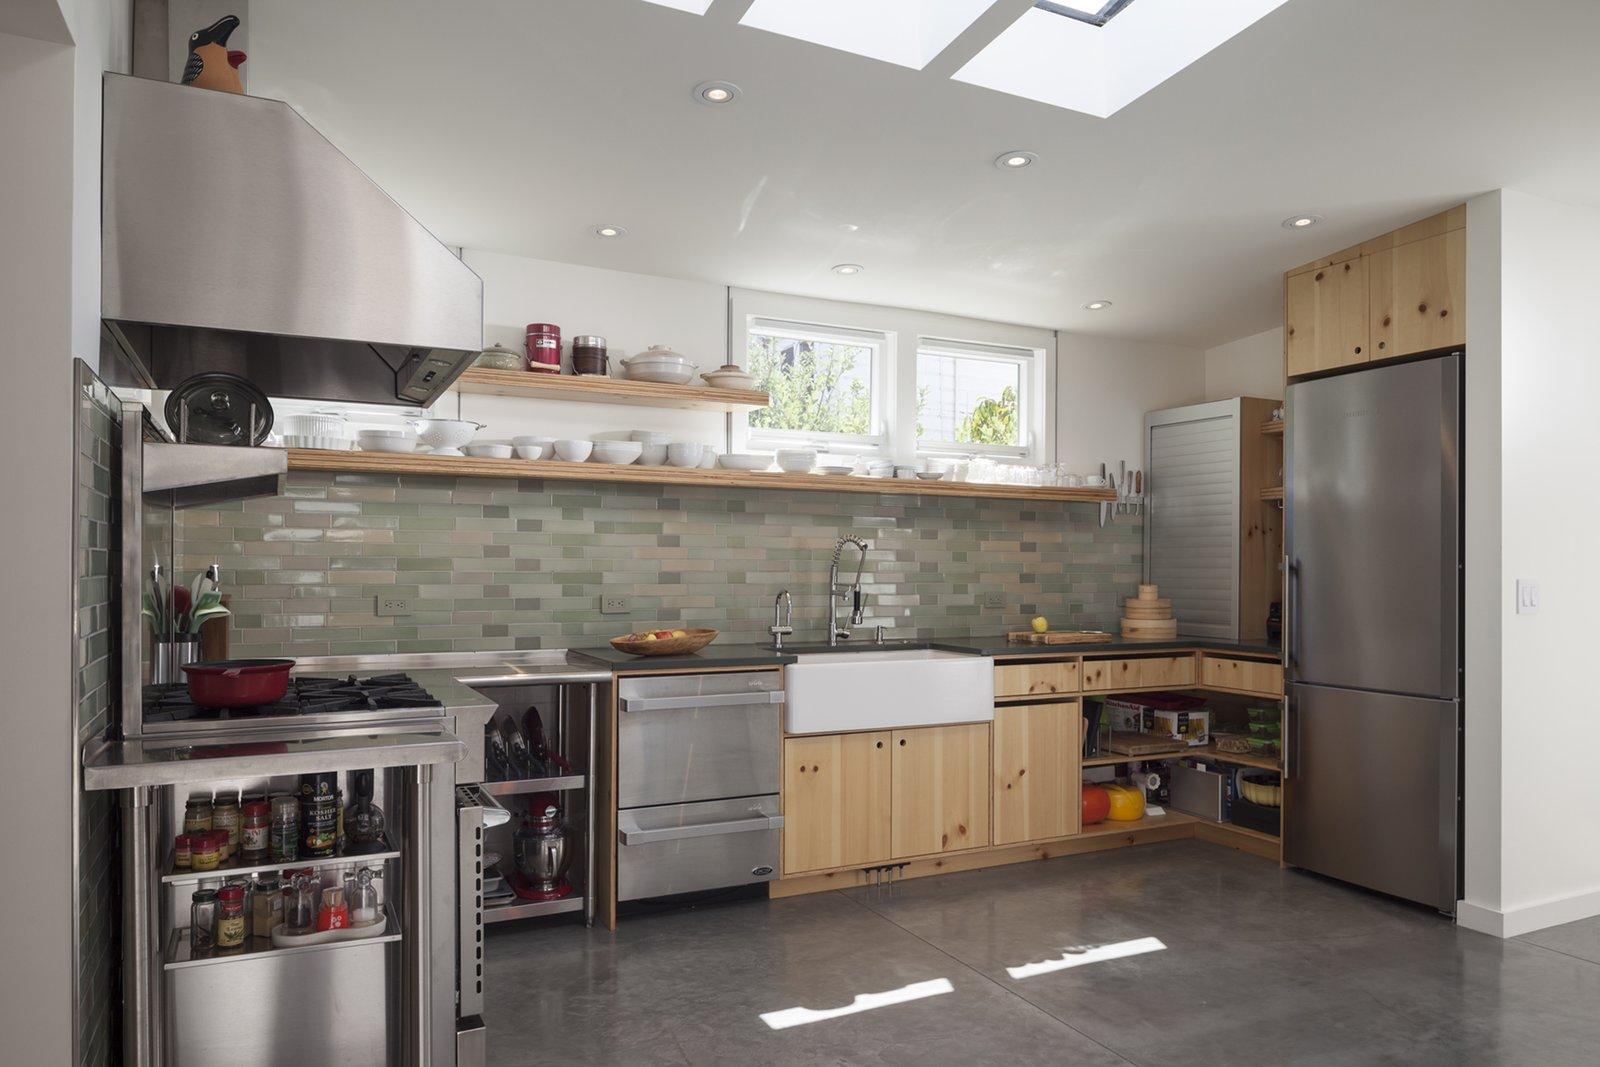 Kitchen, Granite Counter, Metal Counter, Wood Cabinet, Concrete Floor, Glass Tile Backsplashe, Recessed Lighting, Range, Drop In Sink, Refrigerator, and Range Hood  Shotwell Residence by Todd Davis Architecture